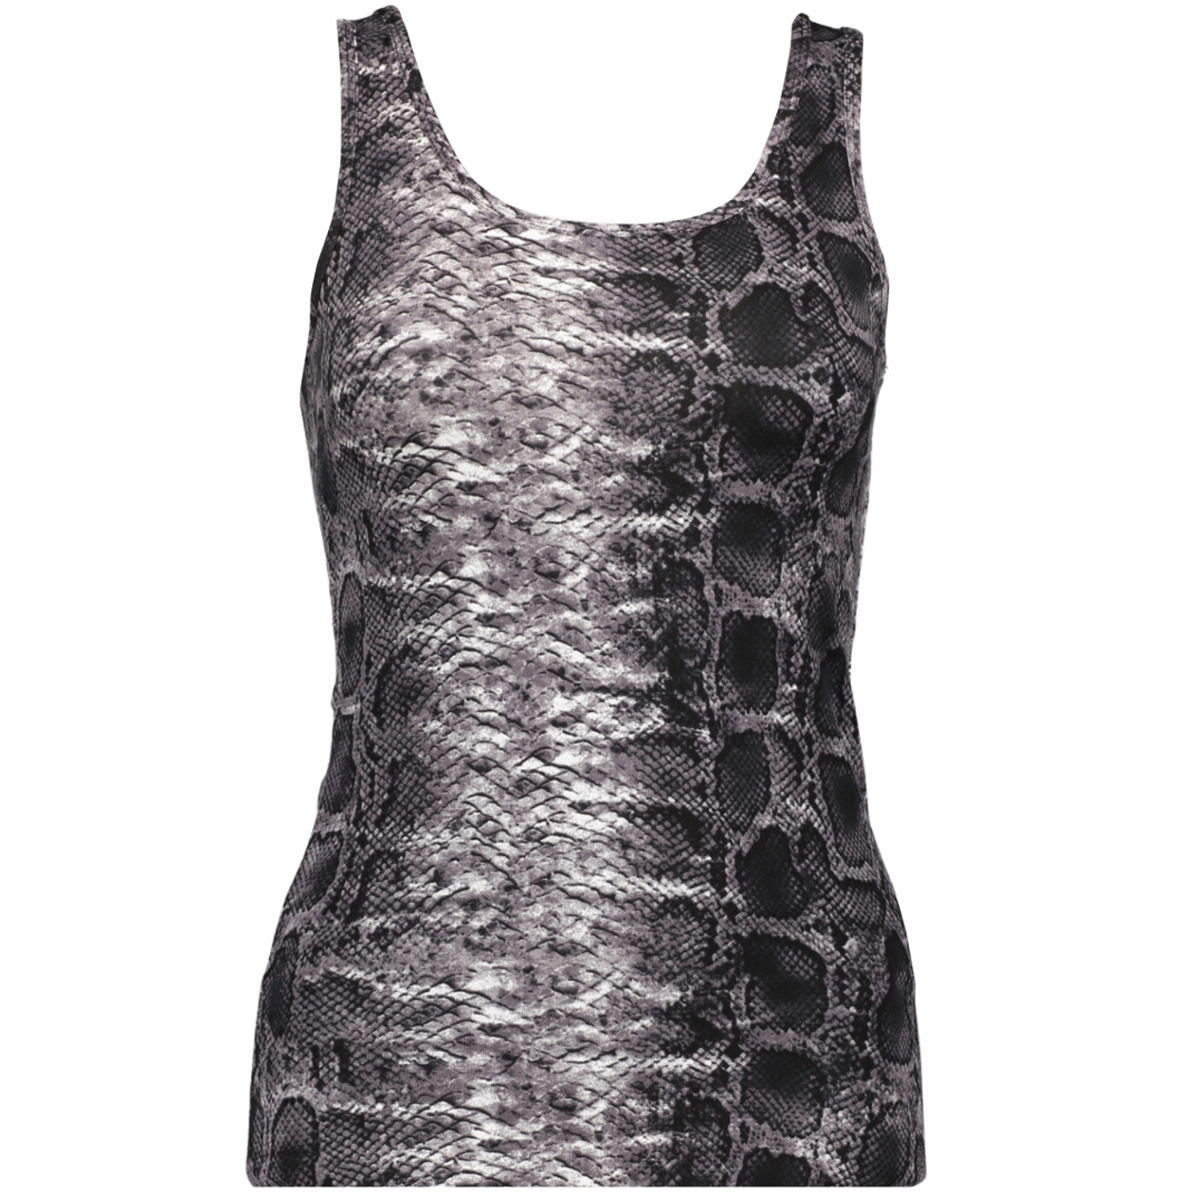 onllive love  printed tank top jrs 15170352 only top cloud dancer/snake grey